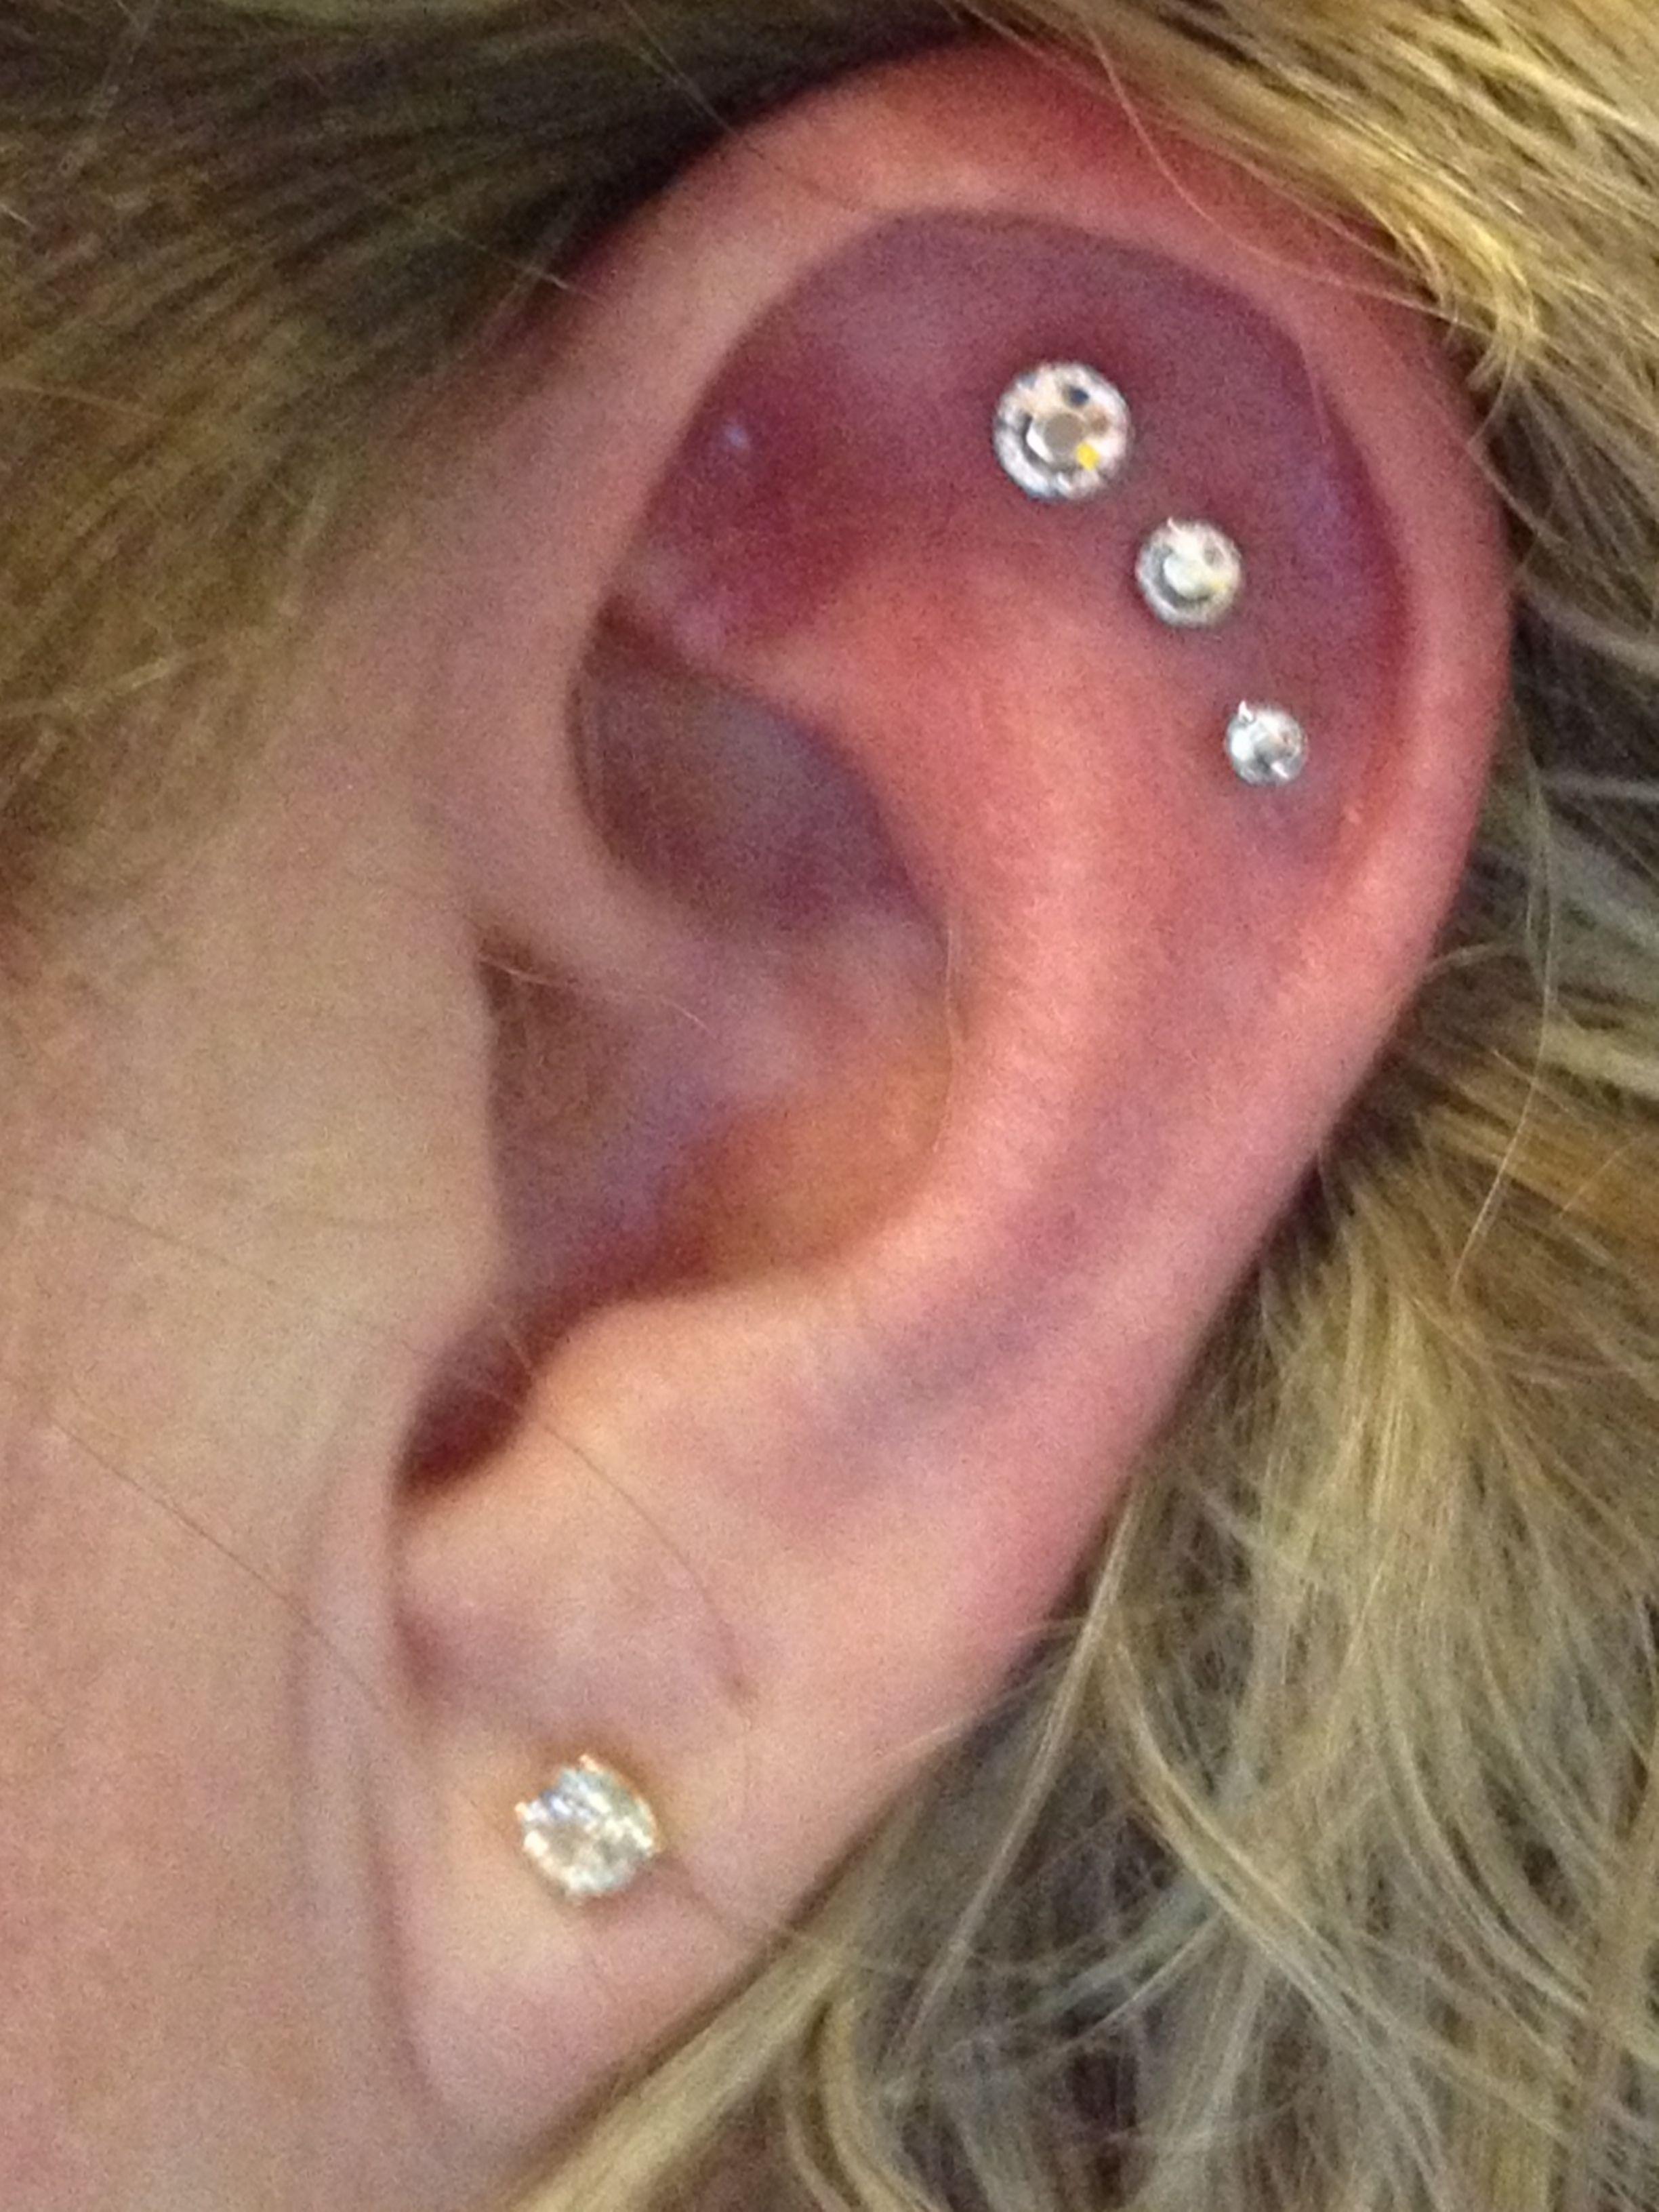 Trifecta Of Innner Ear Cartilage Piercings Endless Options